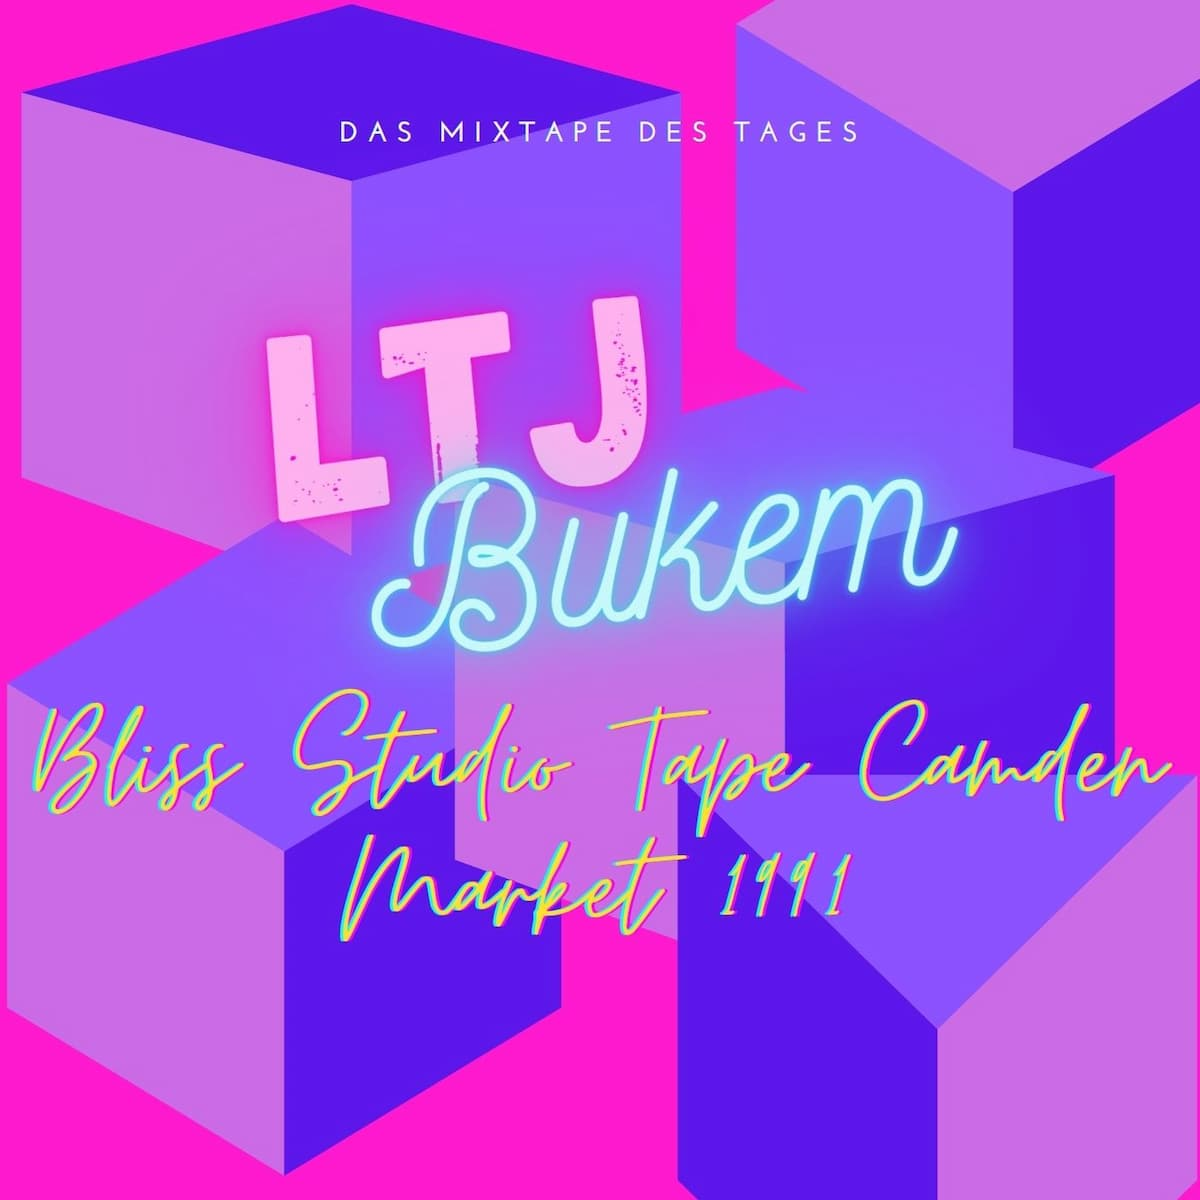 Ltj Bukem Bliss Studio Tape Camden Market 1991   Oldschool Drum and Bass Mixtape